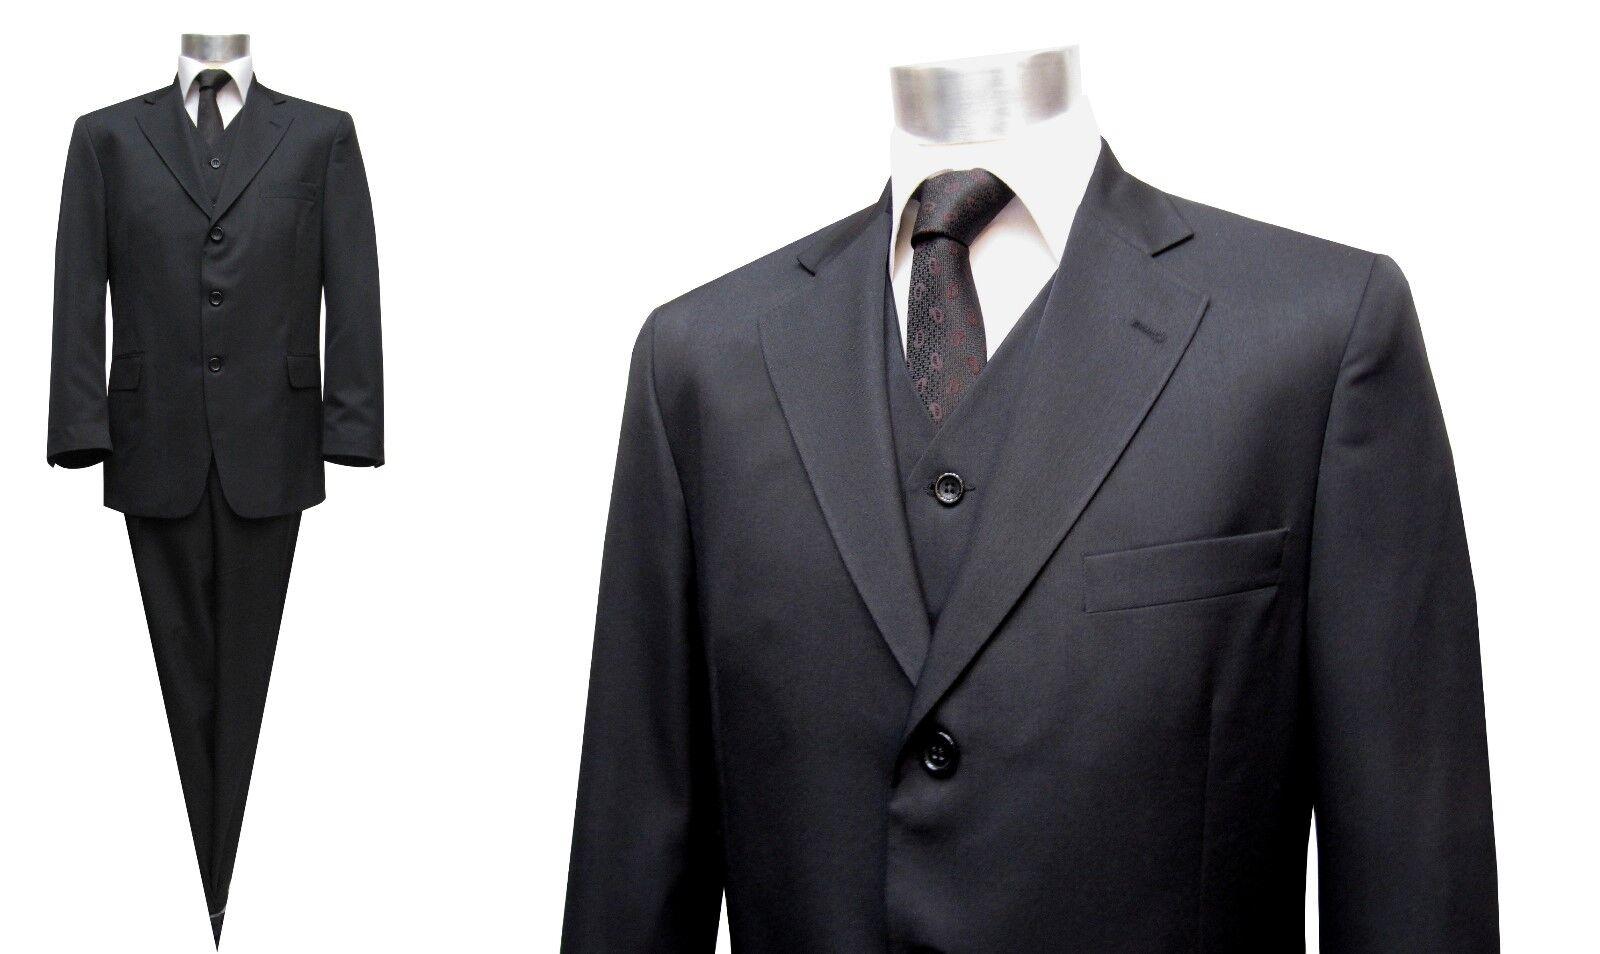 Muga Herren Anzug 3 teilig Gr.31 Schwarz